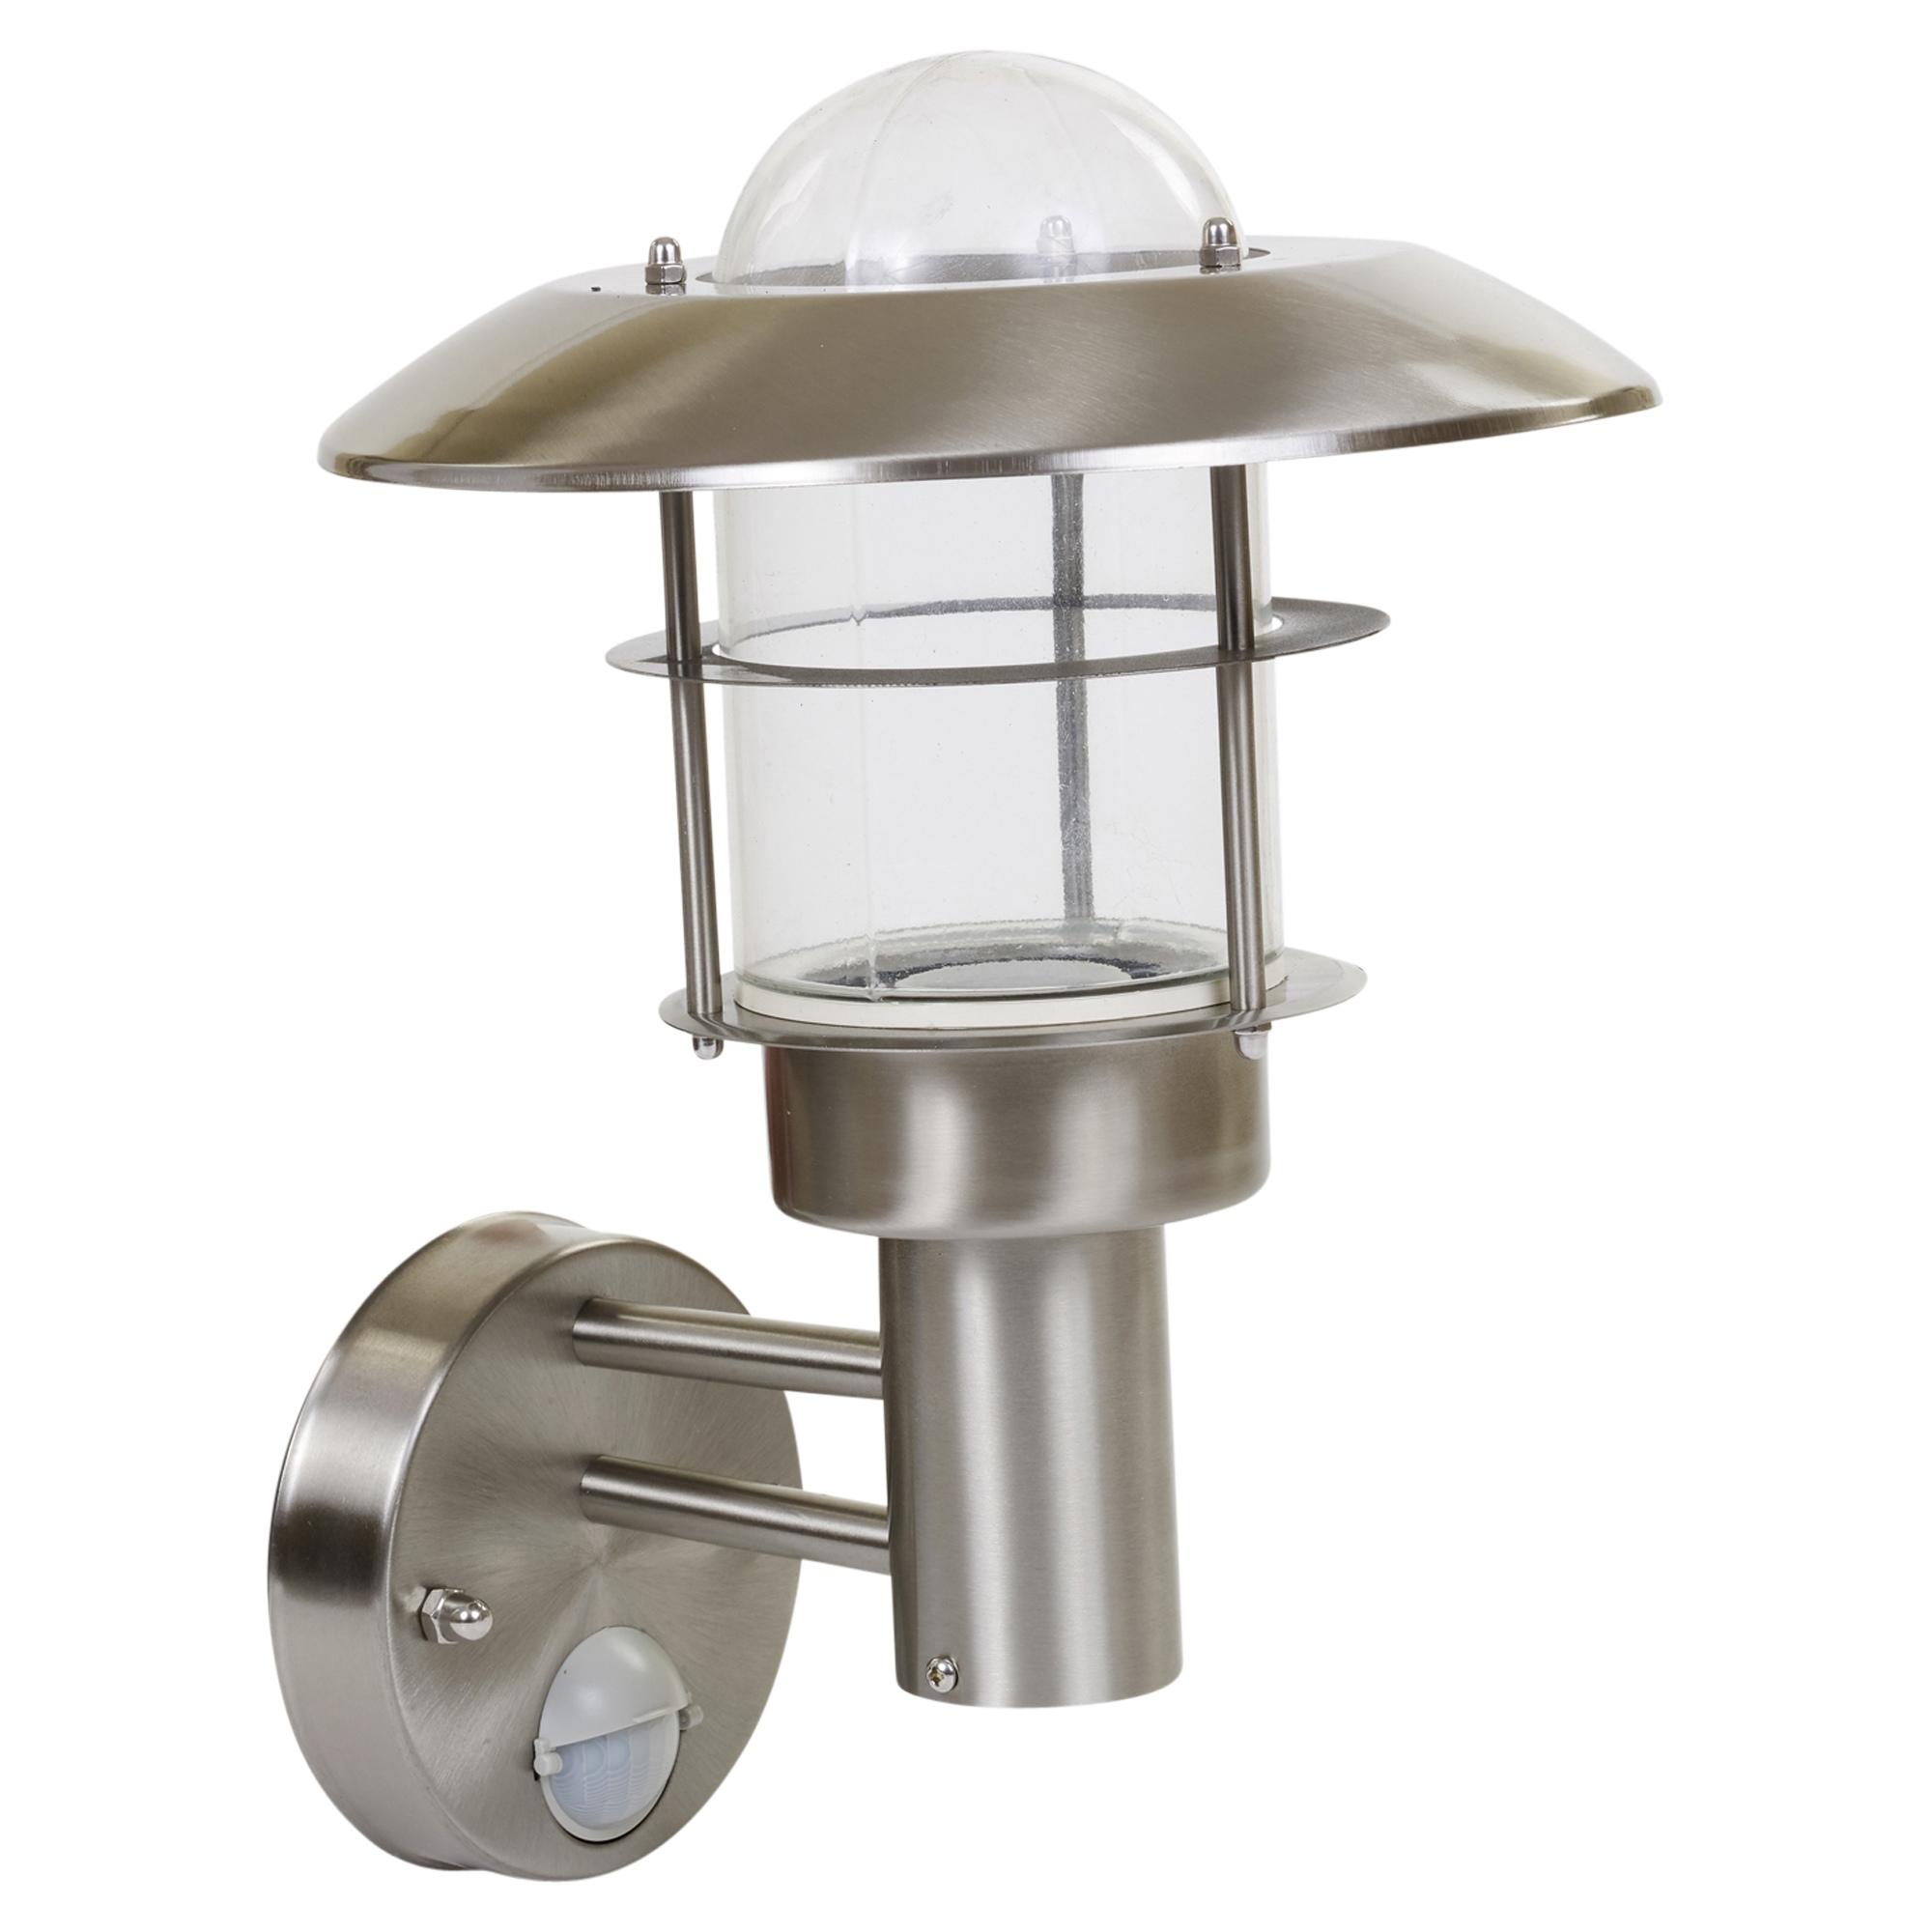 Outdoor Security Lights With Sensor Argos: Outdoor Security Lights With Sensor Homebase